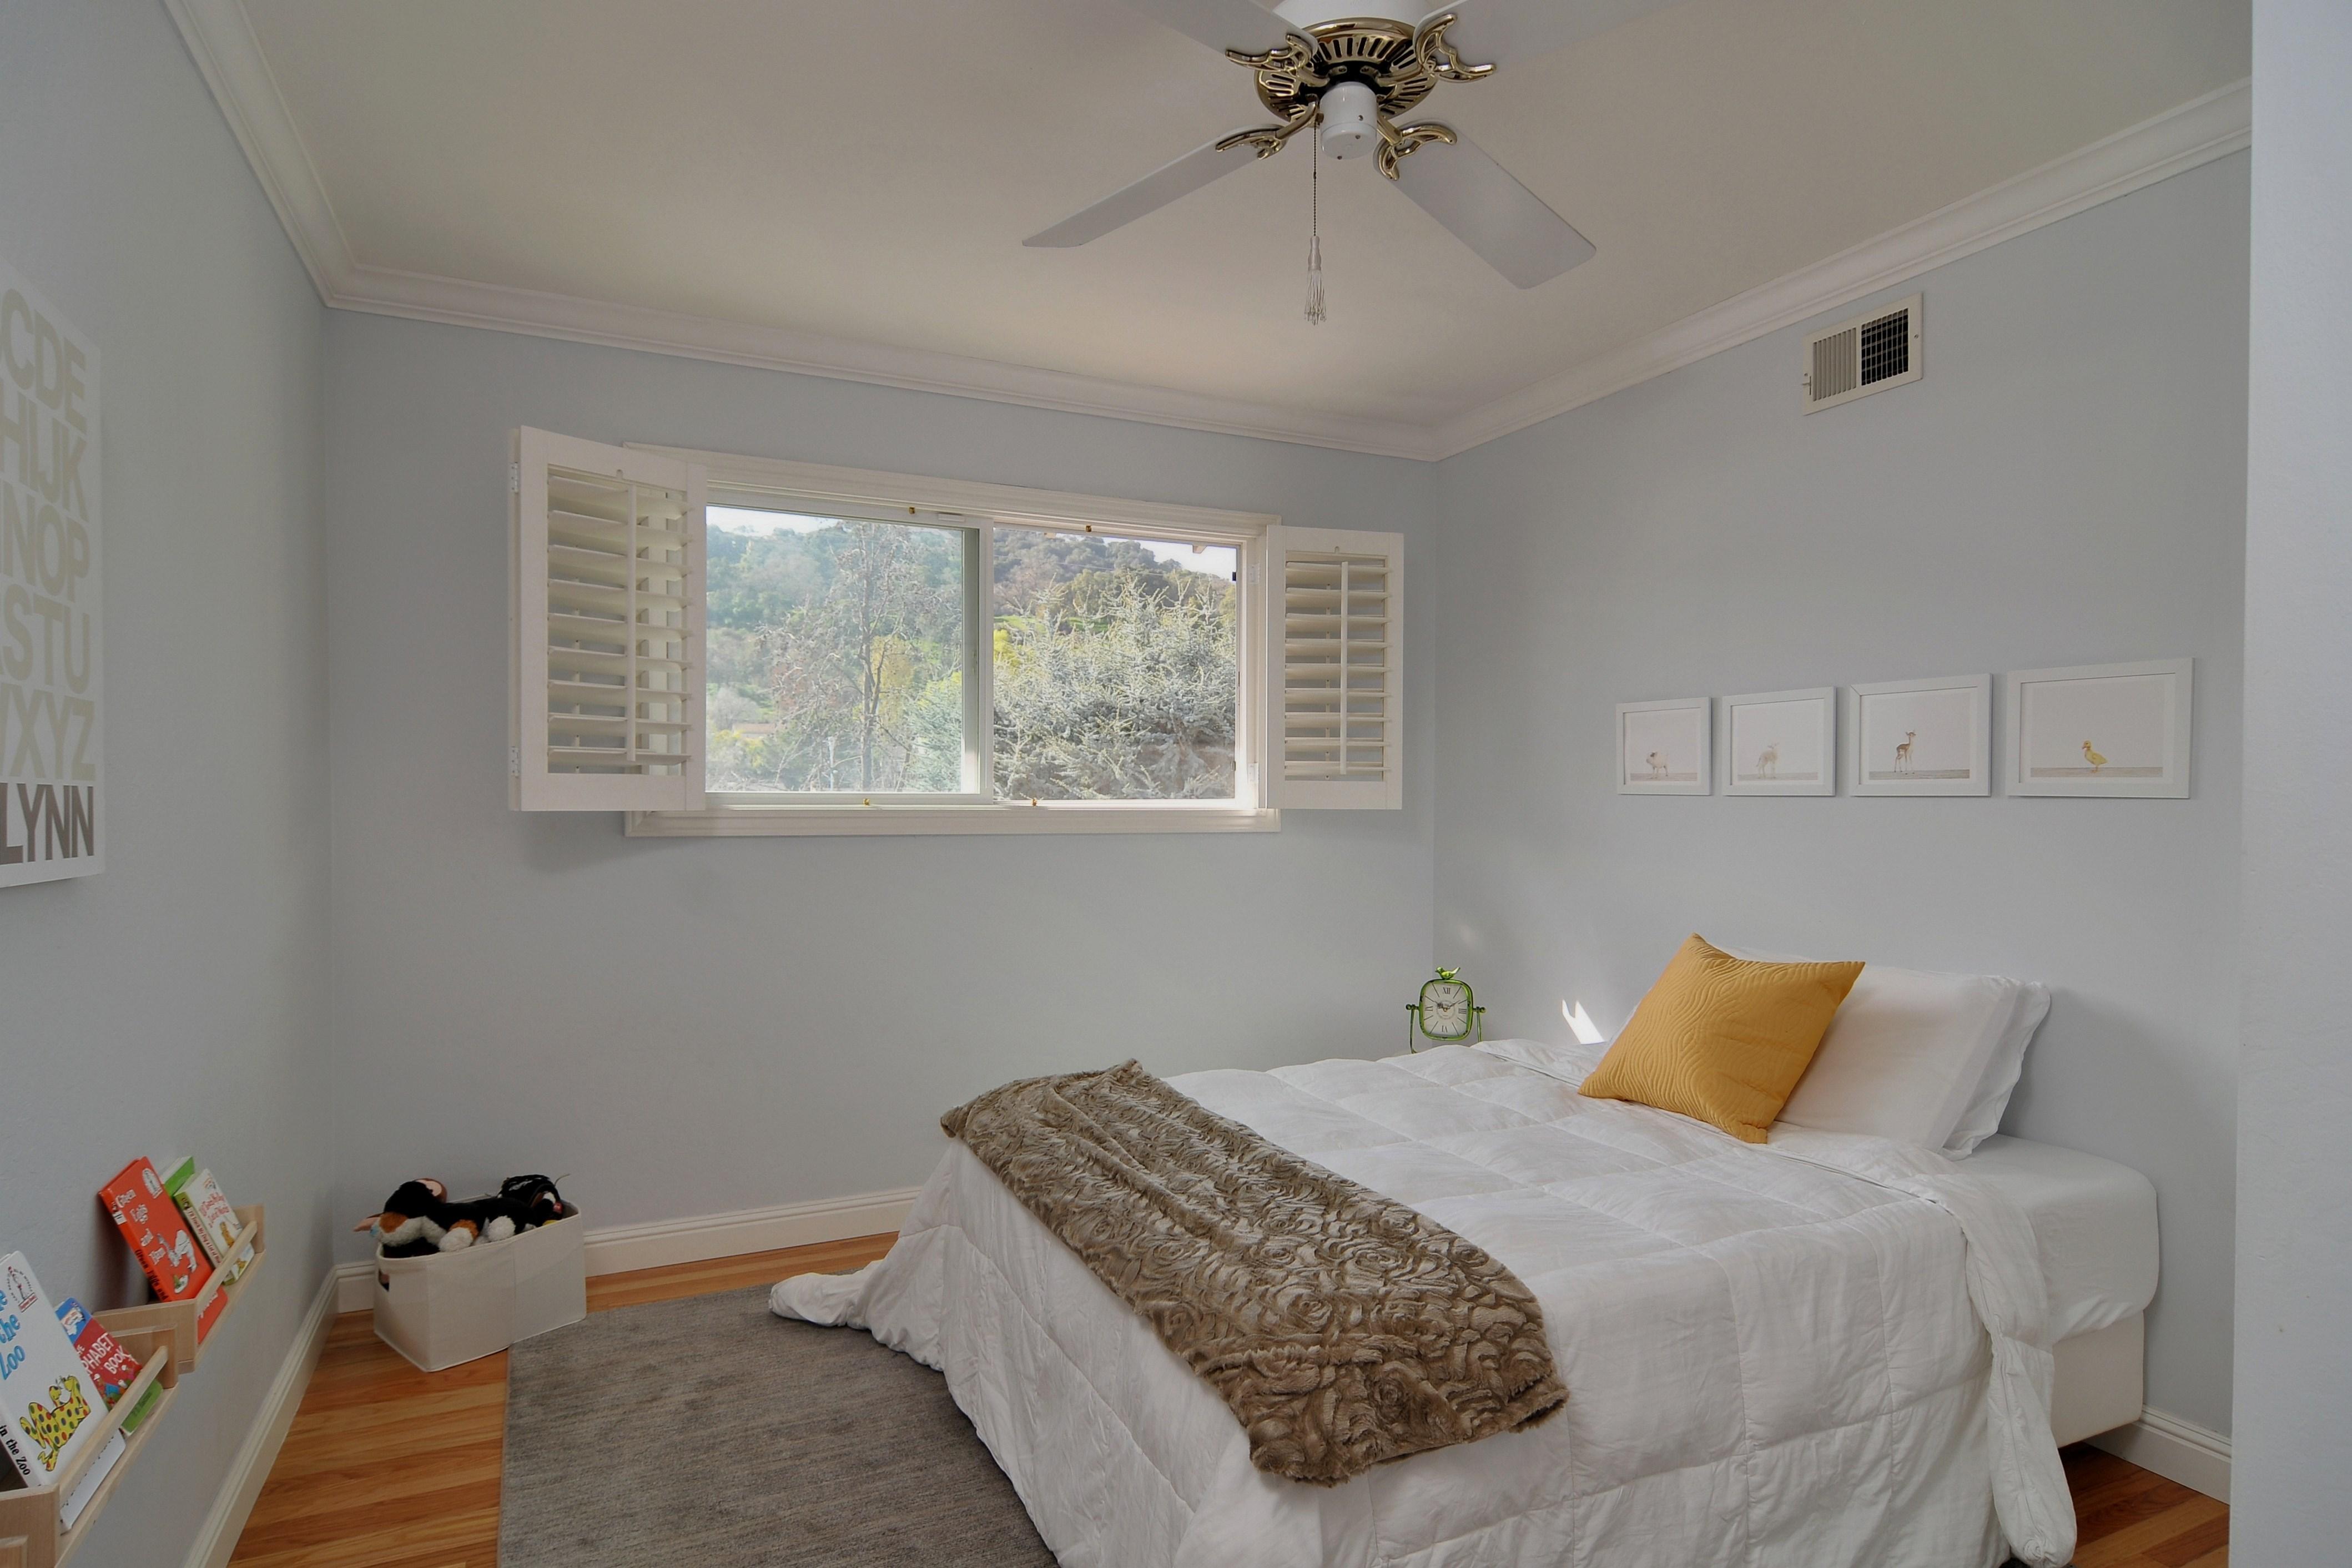 022 Bedroom 5 - Exquisite, expansive, remodeled Belwood home - 127 Belhaven Drive, Los Gatos